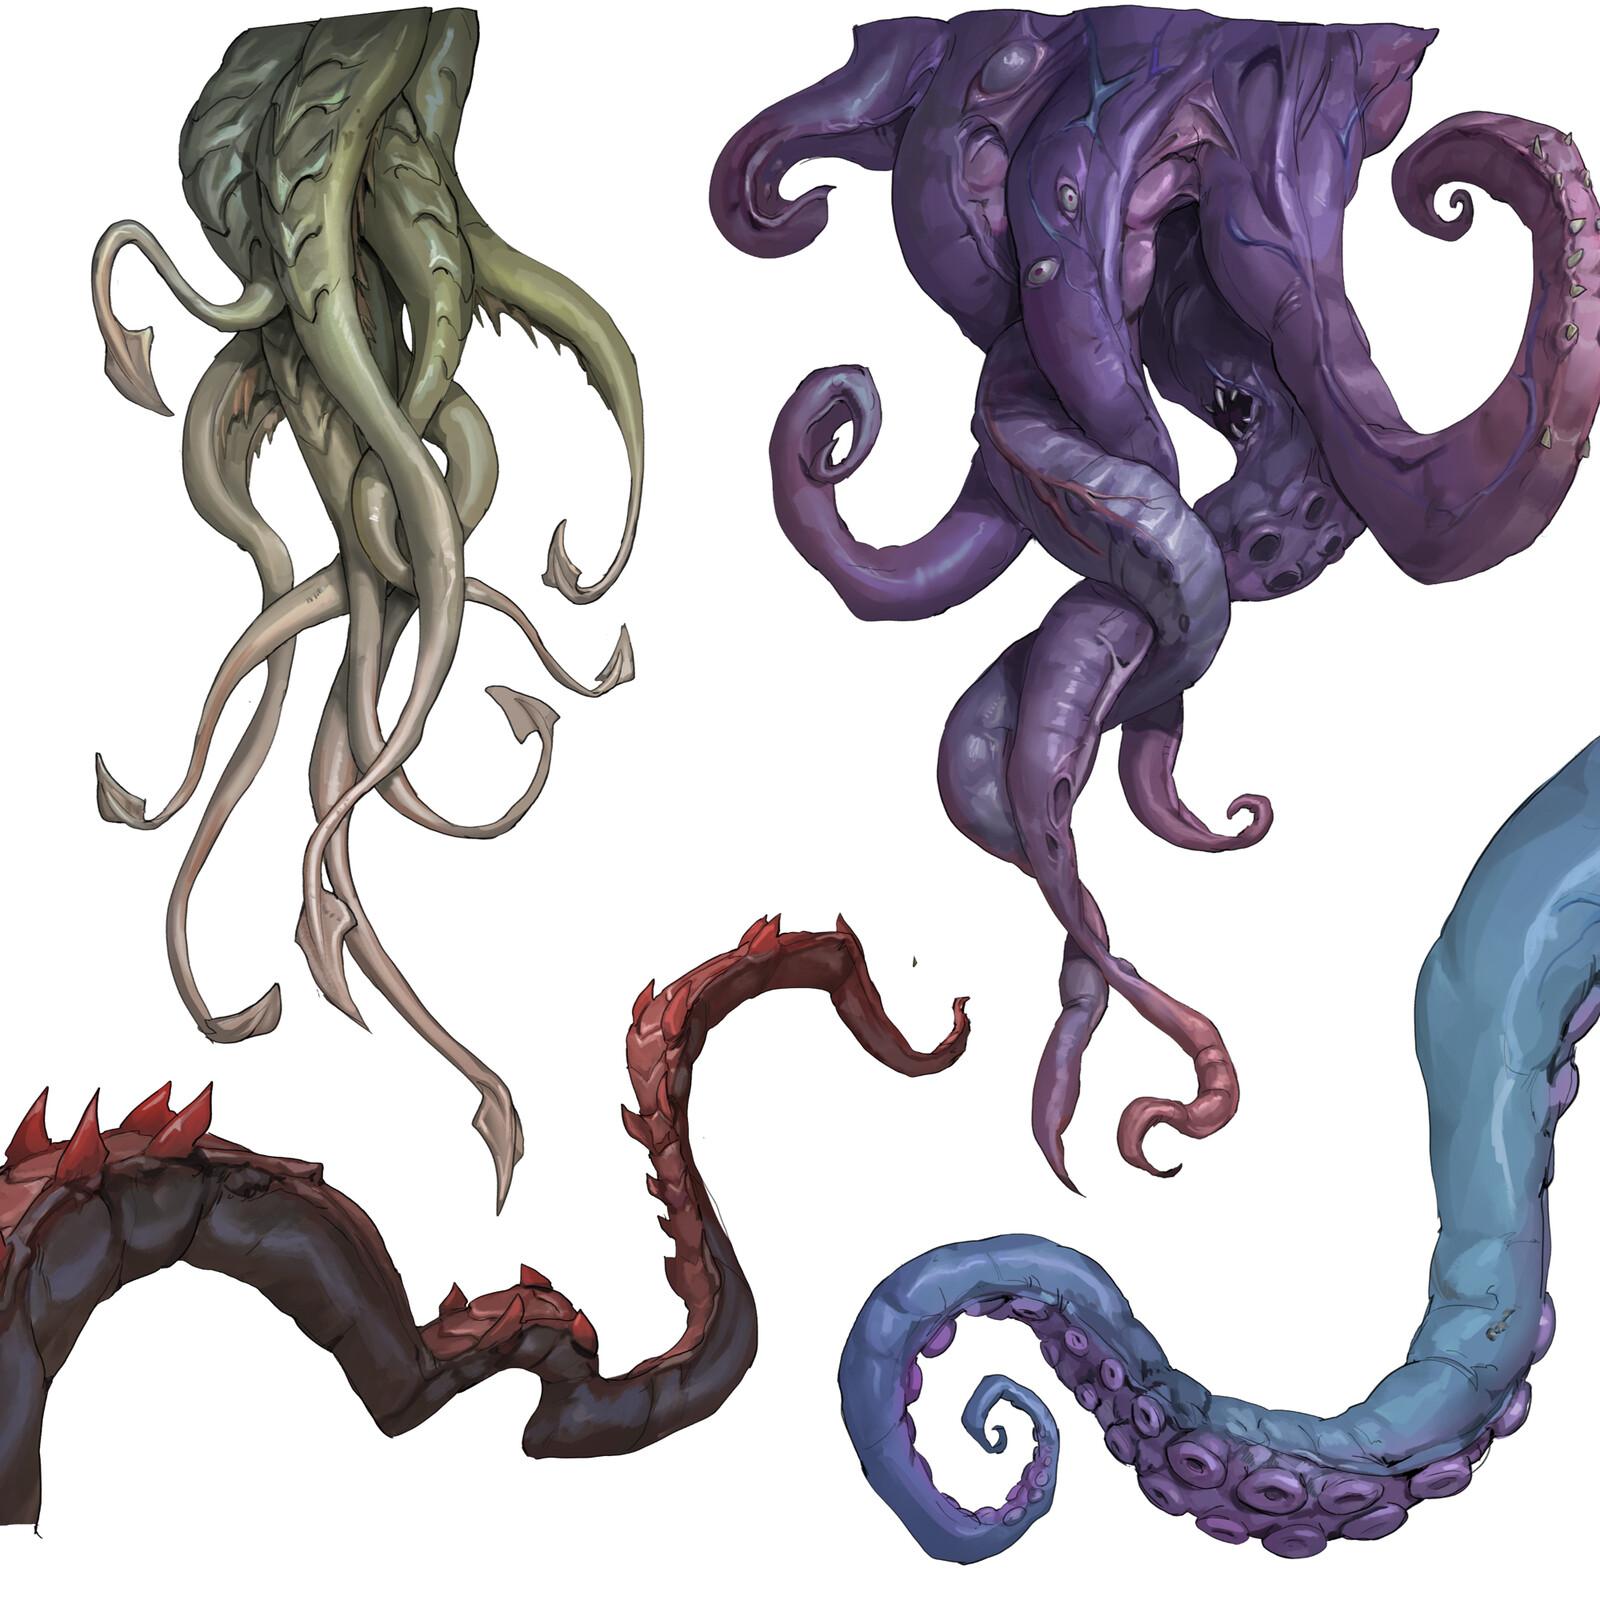 Insomnia | Clutter, tentacles, violin